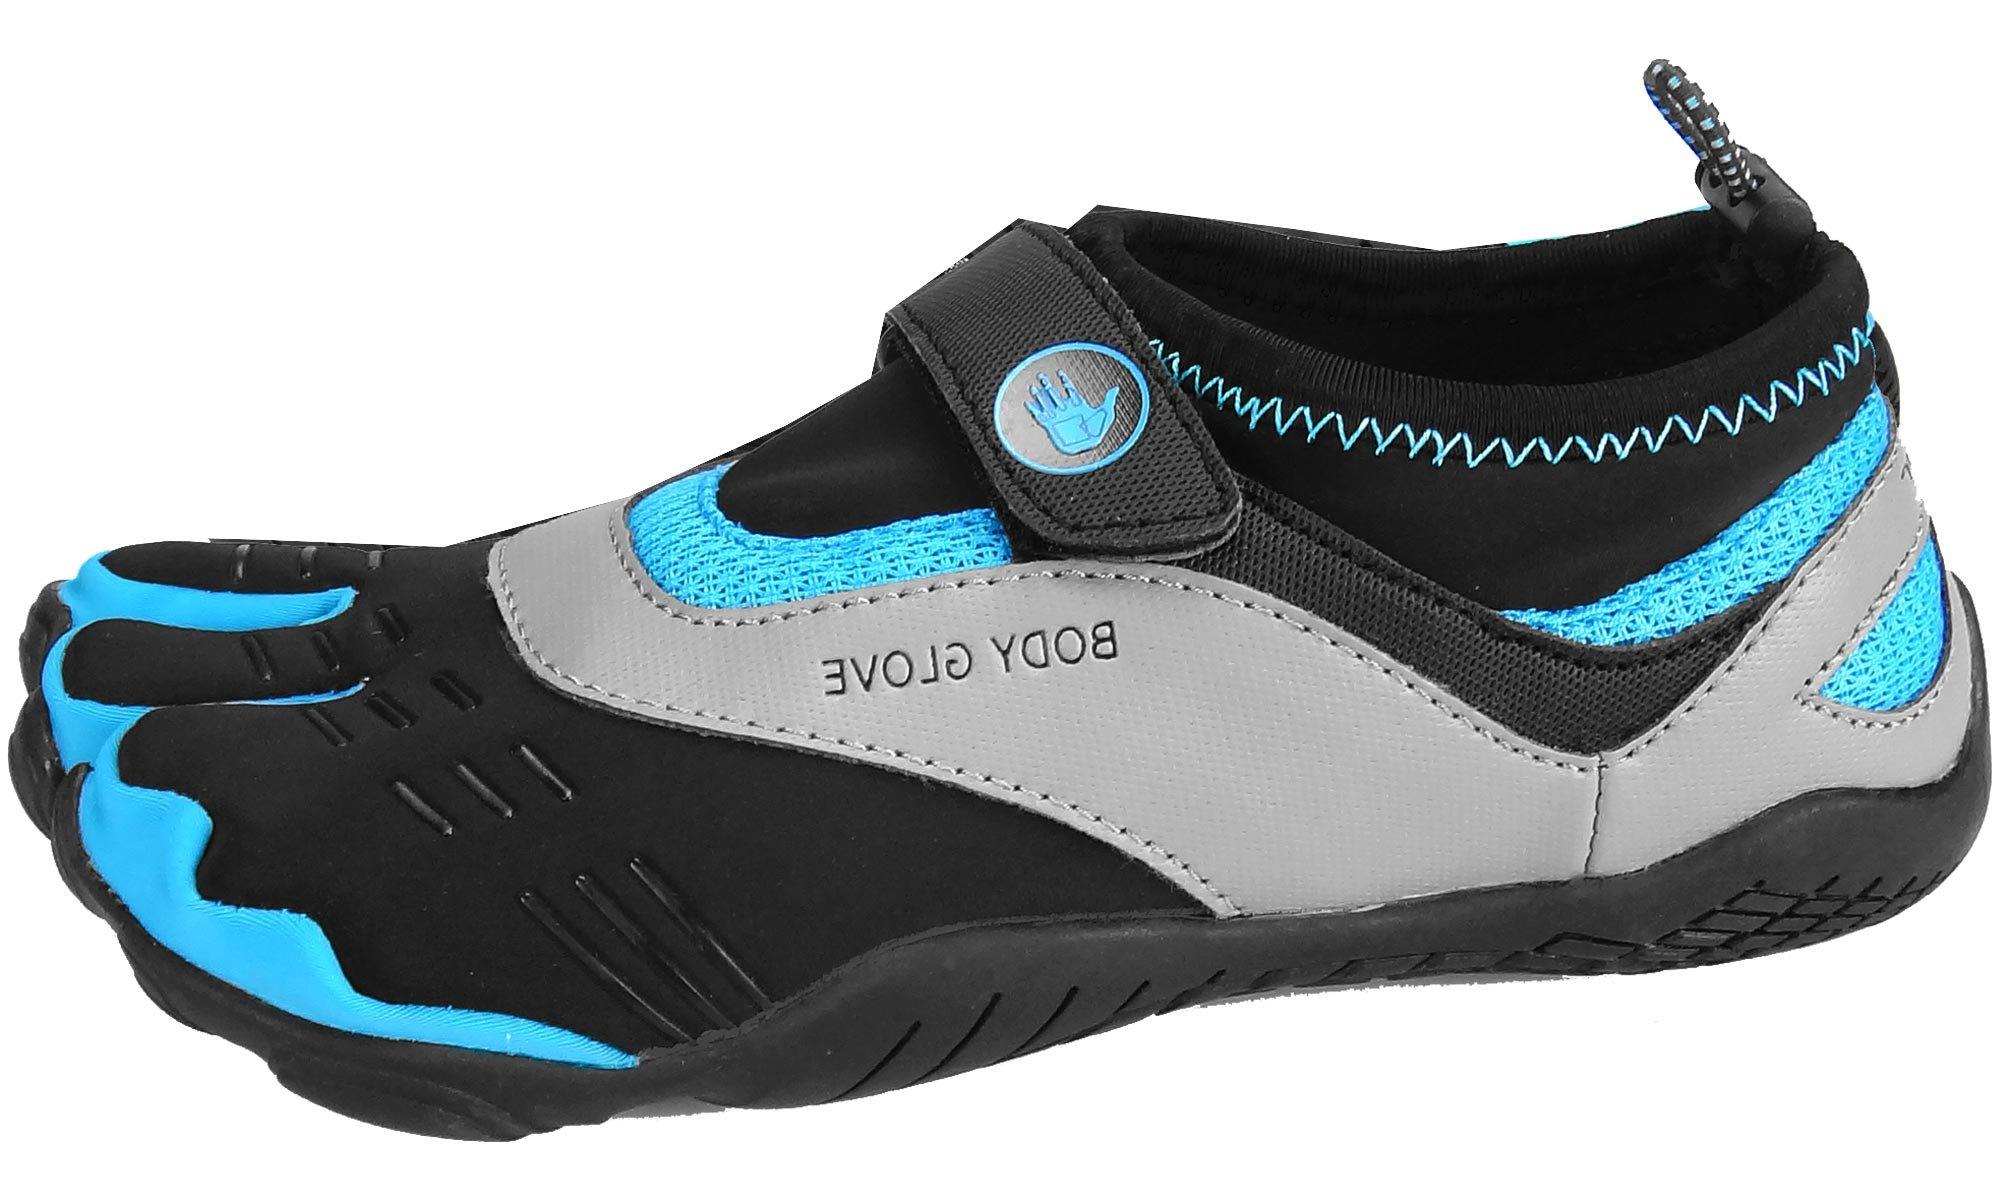 Body Glove Women's Max Trail Running Shoe, Black/Neon Blue, 8.0 M US